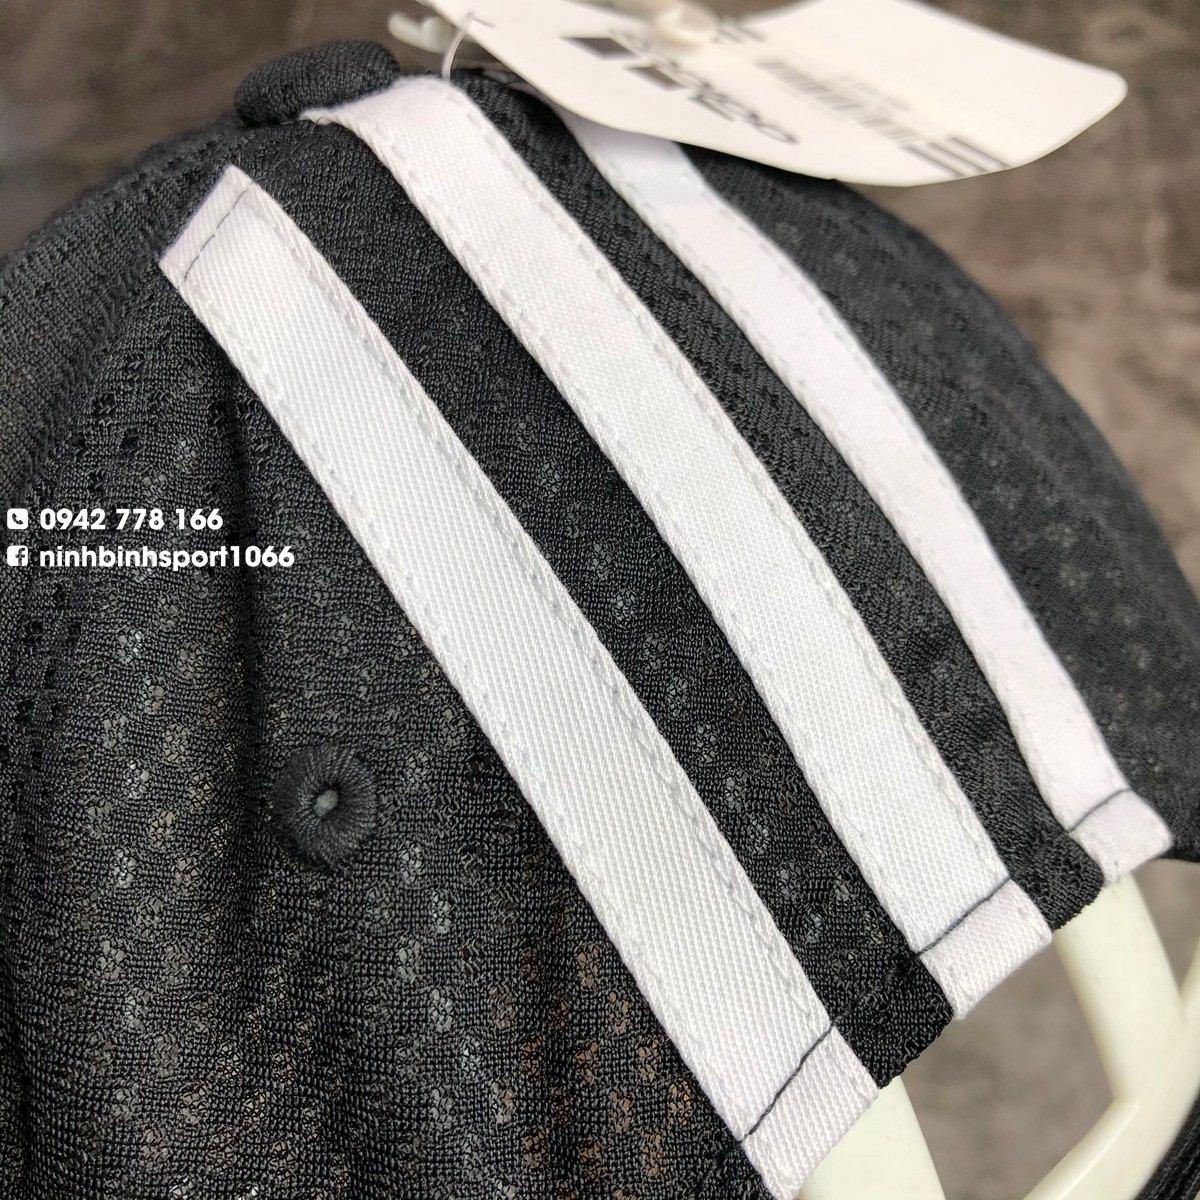 Mũ thể thao Adidas 523-01-OSFZ